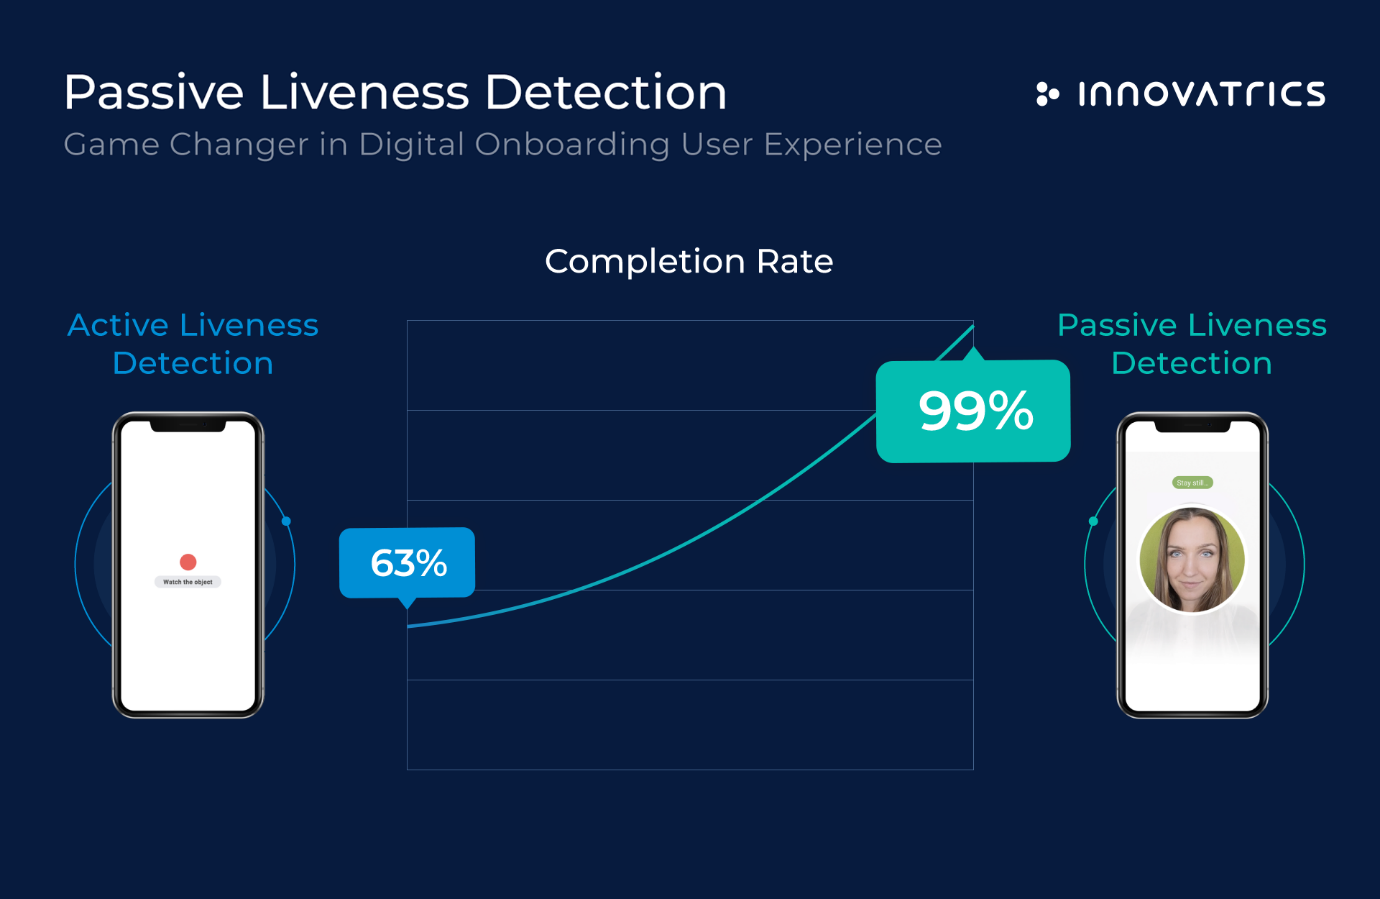 passive liveness detection in digital onboarding